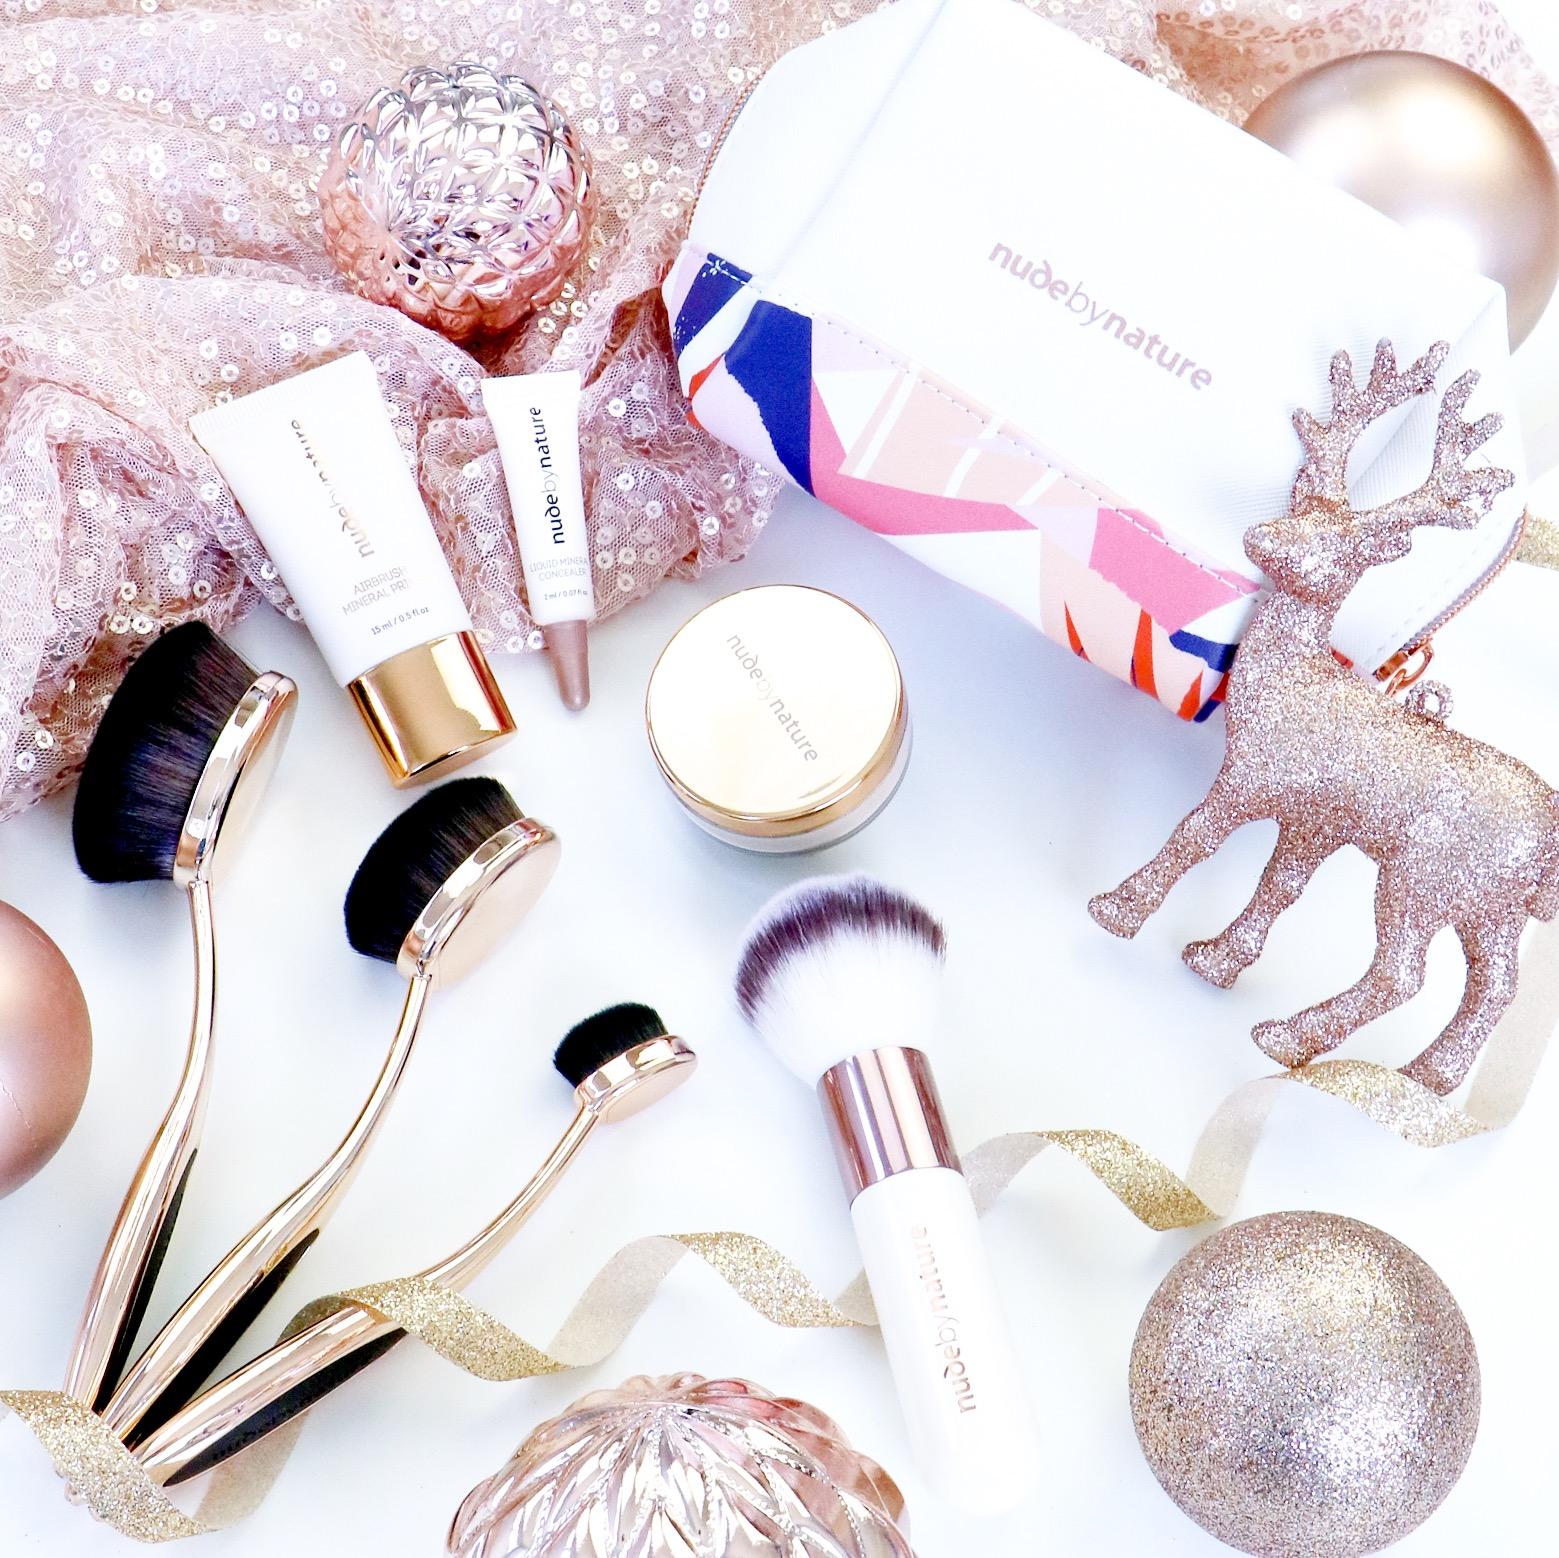 Cruelty Free Gift Guide 2018 - Marisa Robinson Beauty